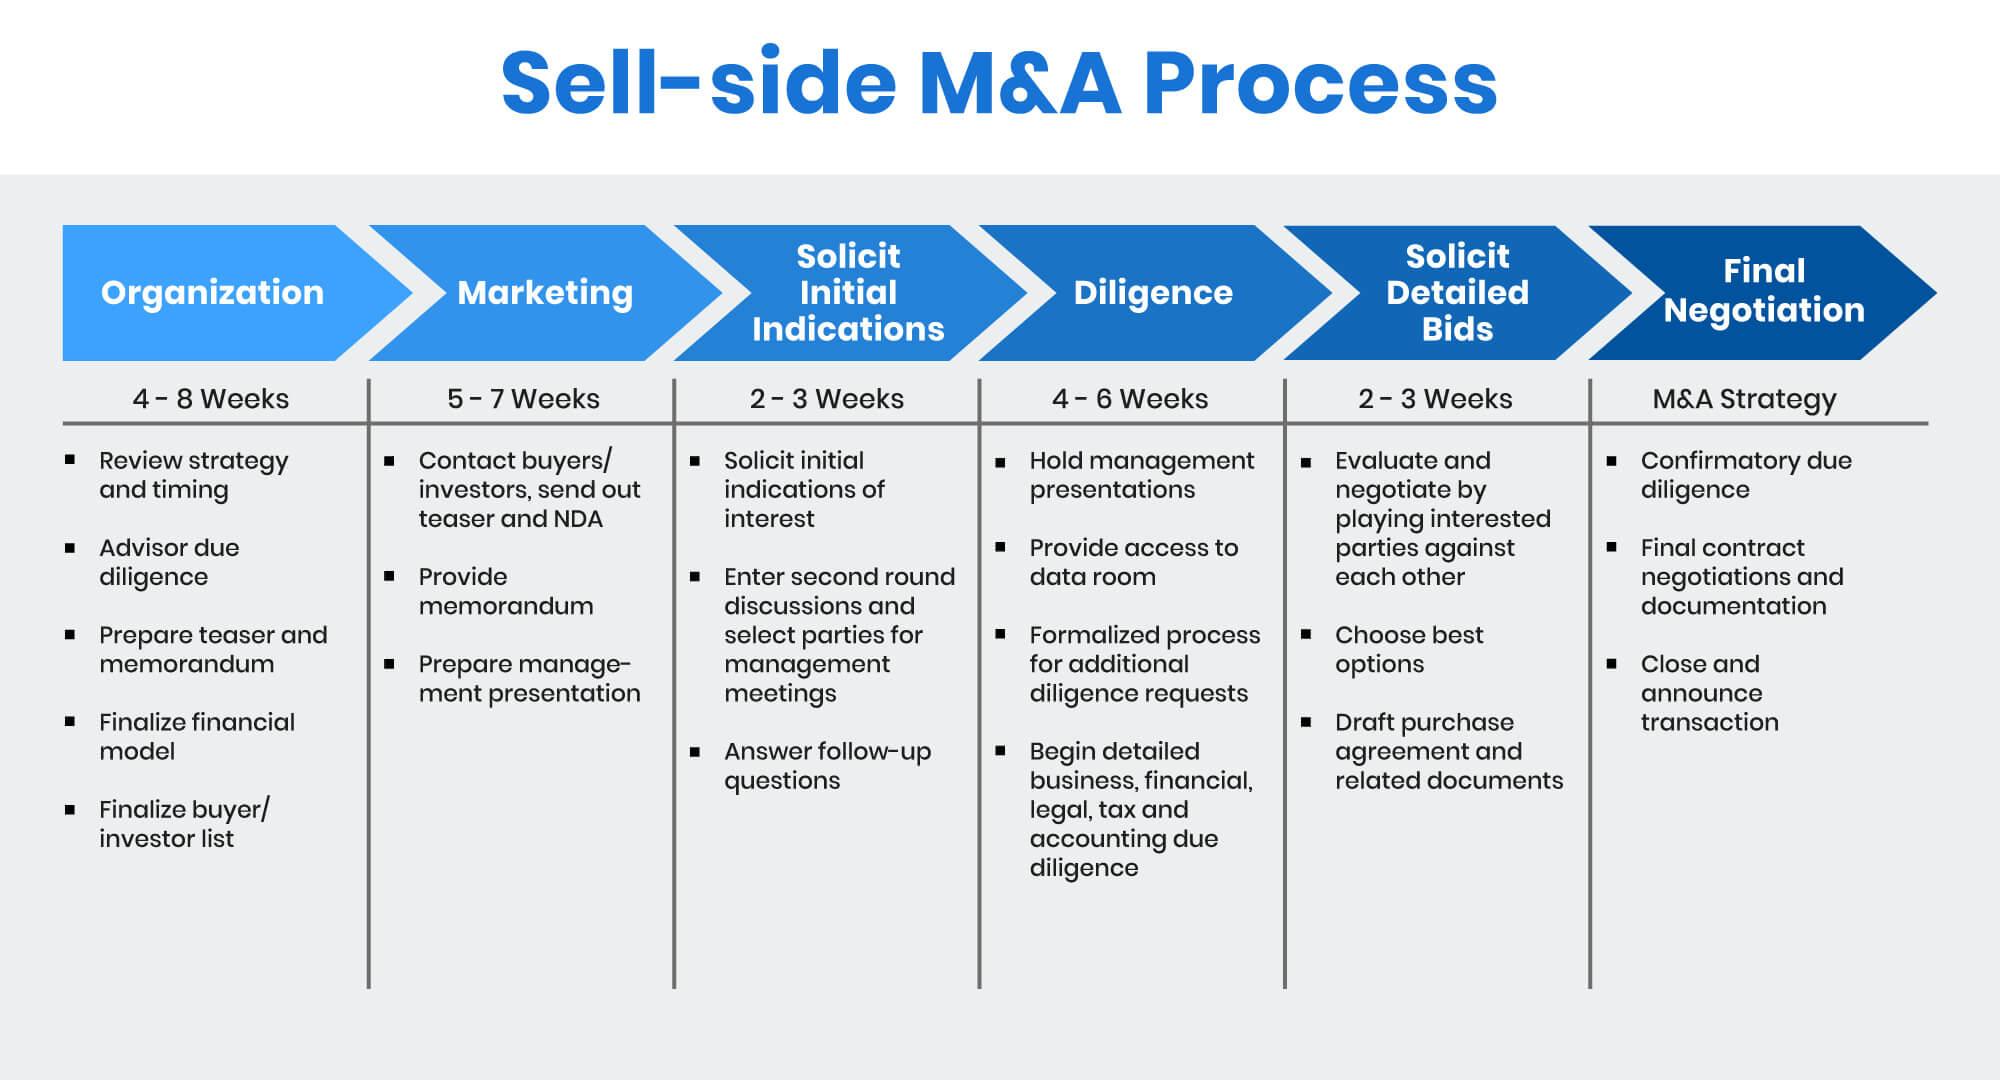 sell-side M&A process